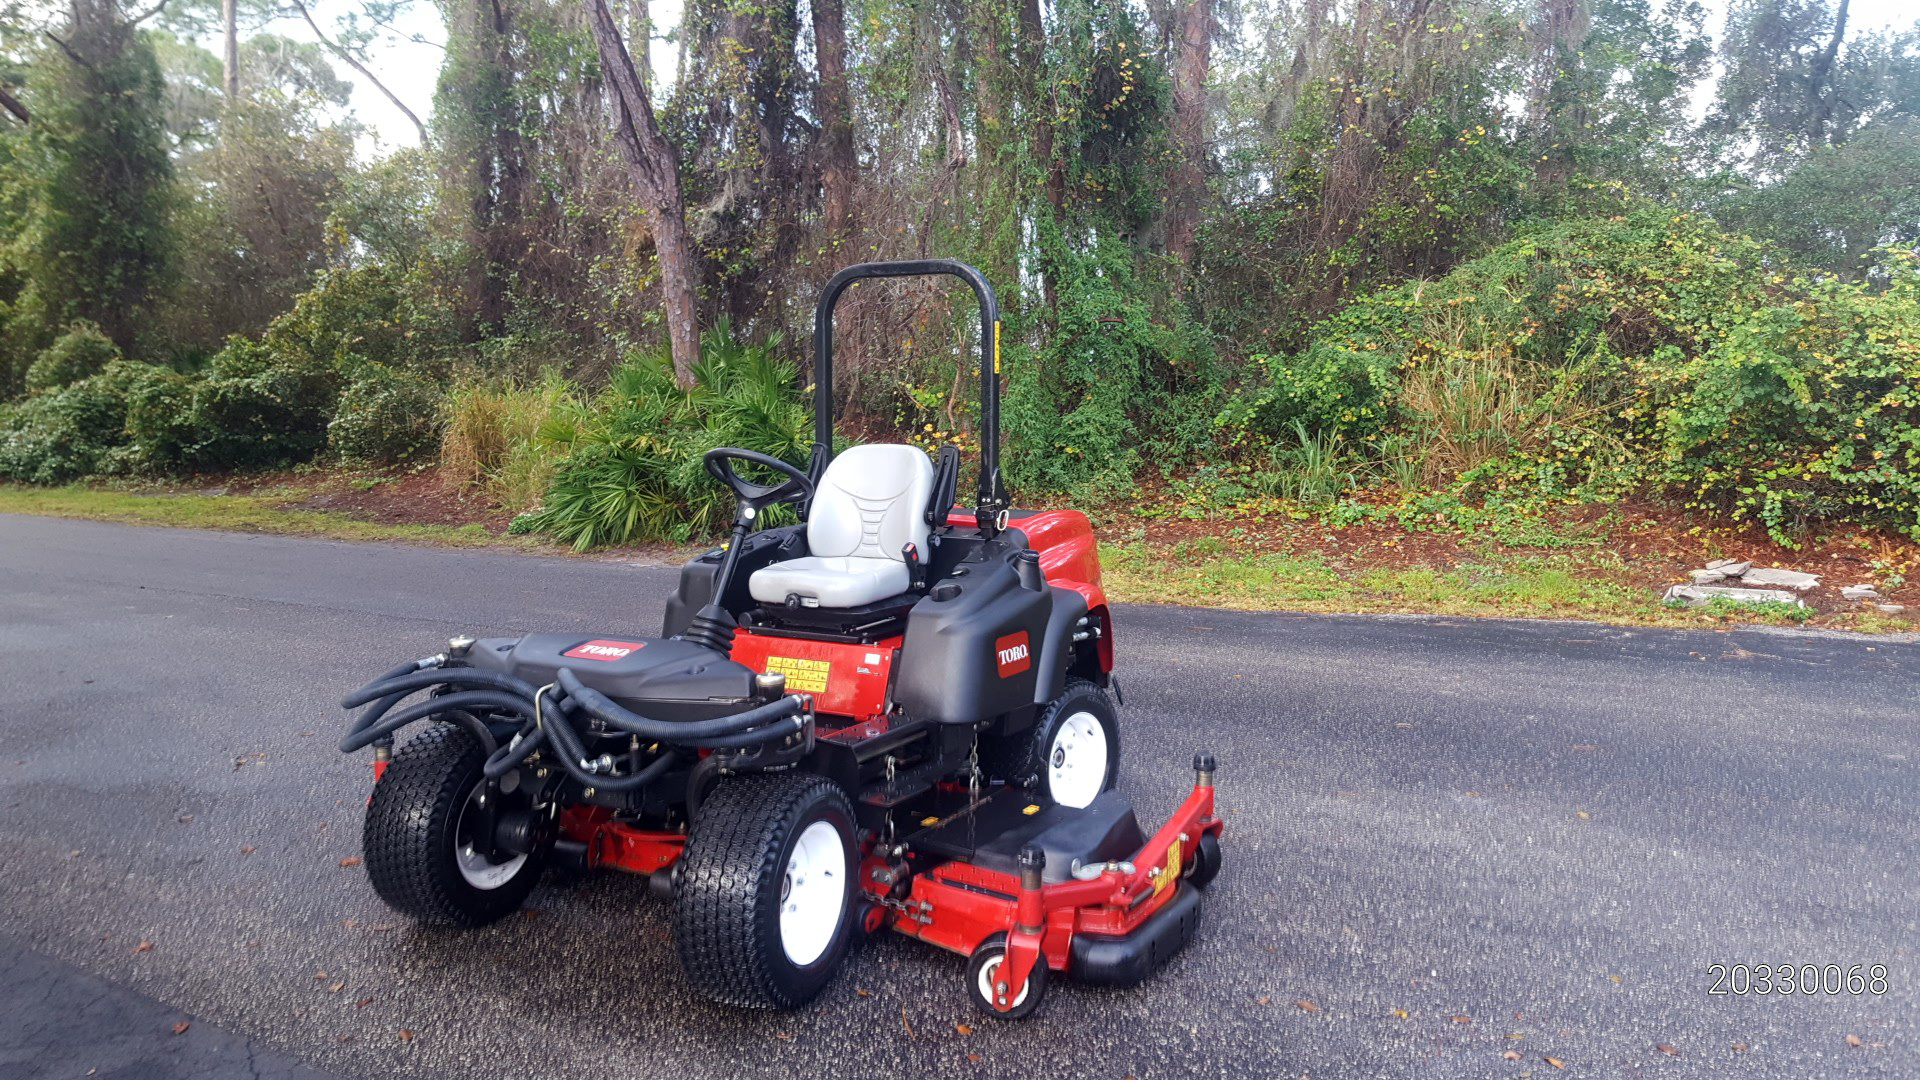 Toro Groundsmaster 360 4WD